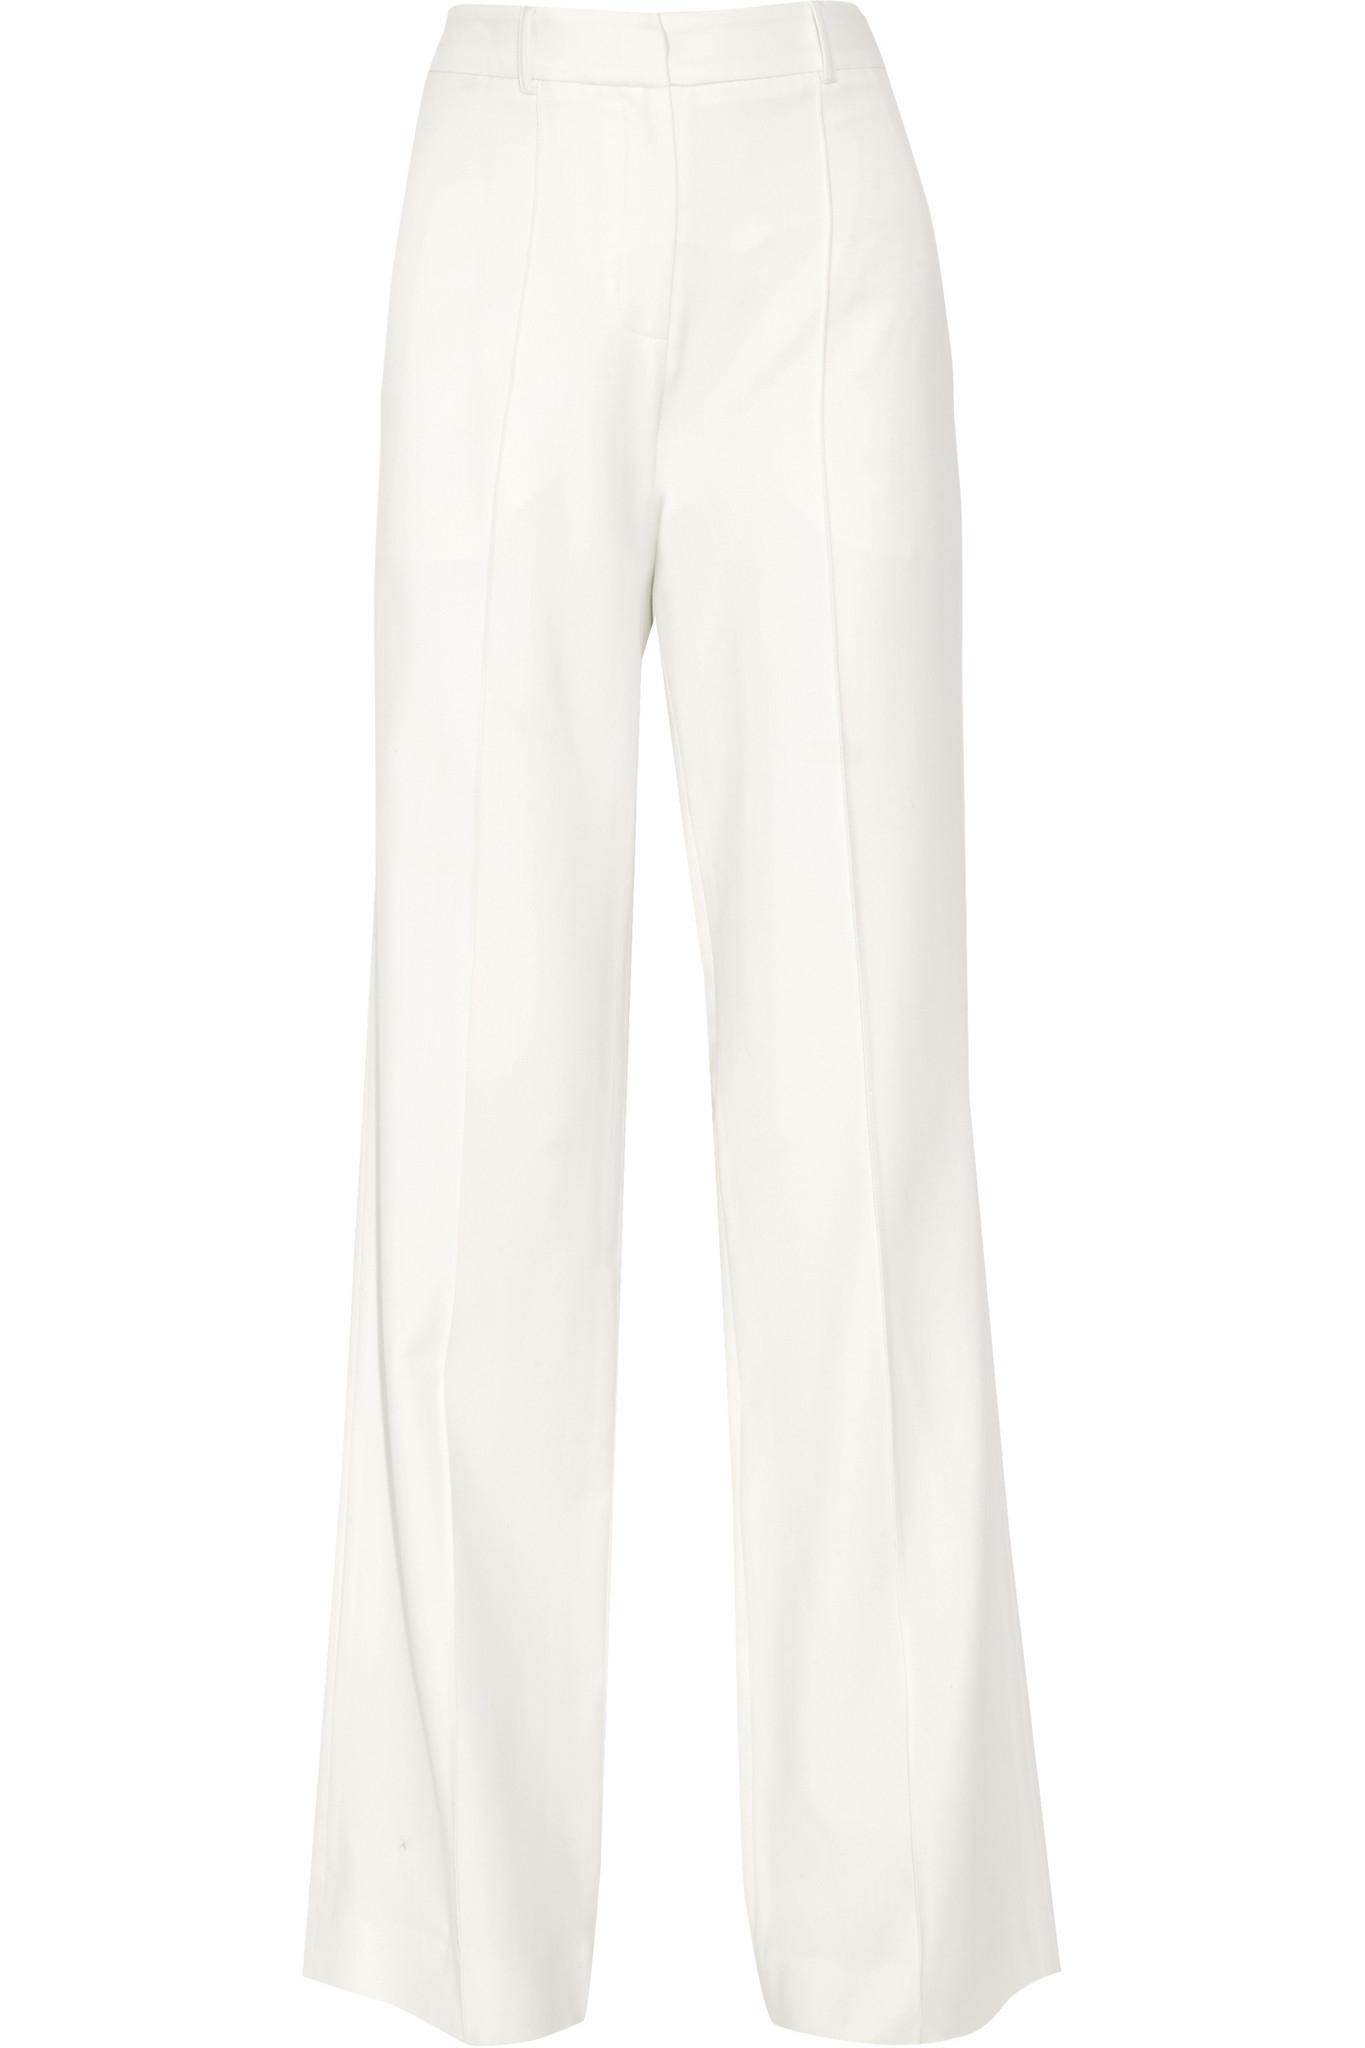 Adam lippes Stretch Wool-blend Wide-leg Pants - Save 16% | Lyst